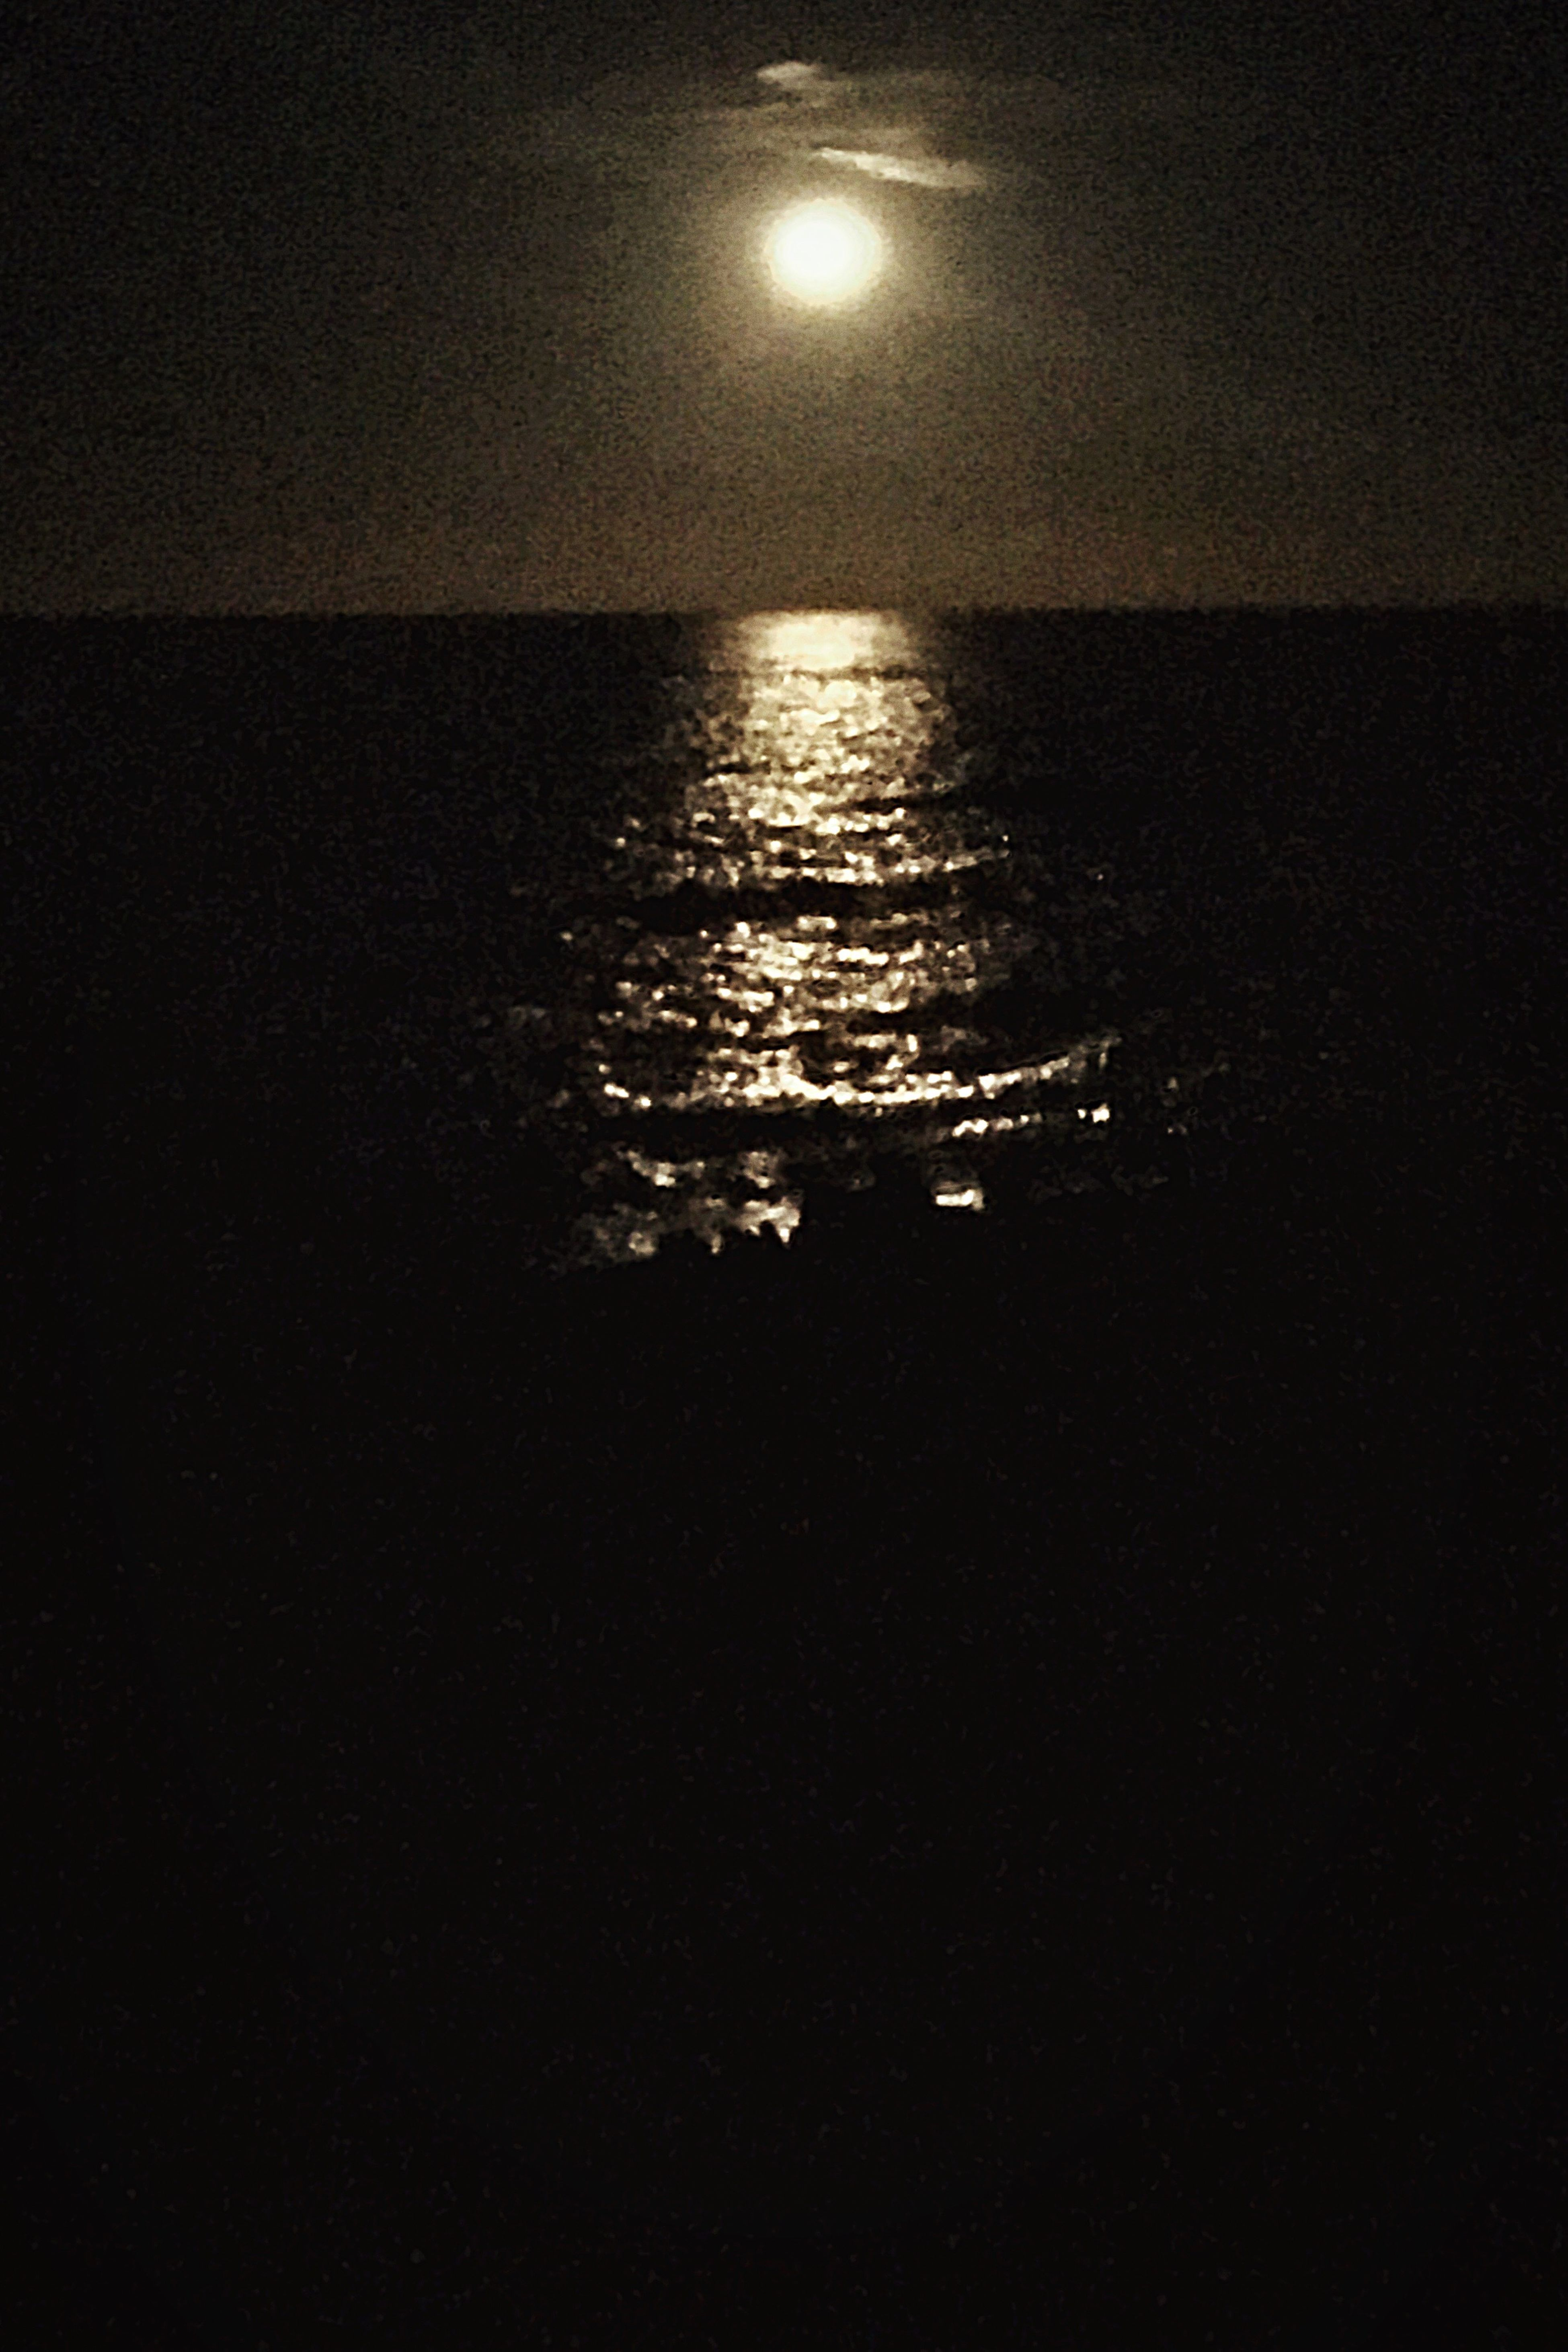 Like an old painting Tranquil Scene Tranquility Beauty In Nature Night Sea Majestic Seascape Moonlight Dark Atmospheric Mood Atmosphere Sardinia Sea And Sky Sardinia Sea Collection Sardinia Seascape Bestoftheday Bestshots Best EyeEm Shot Best Of EyeEm